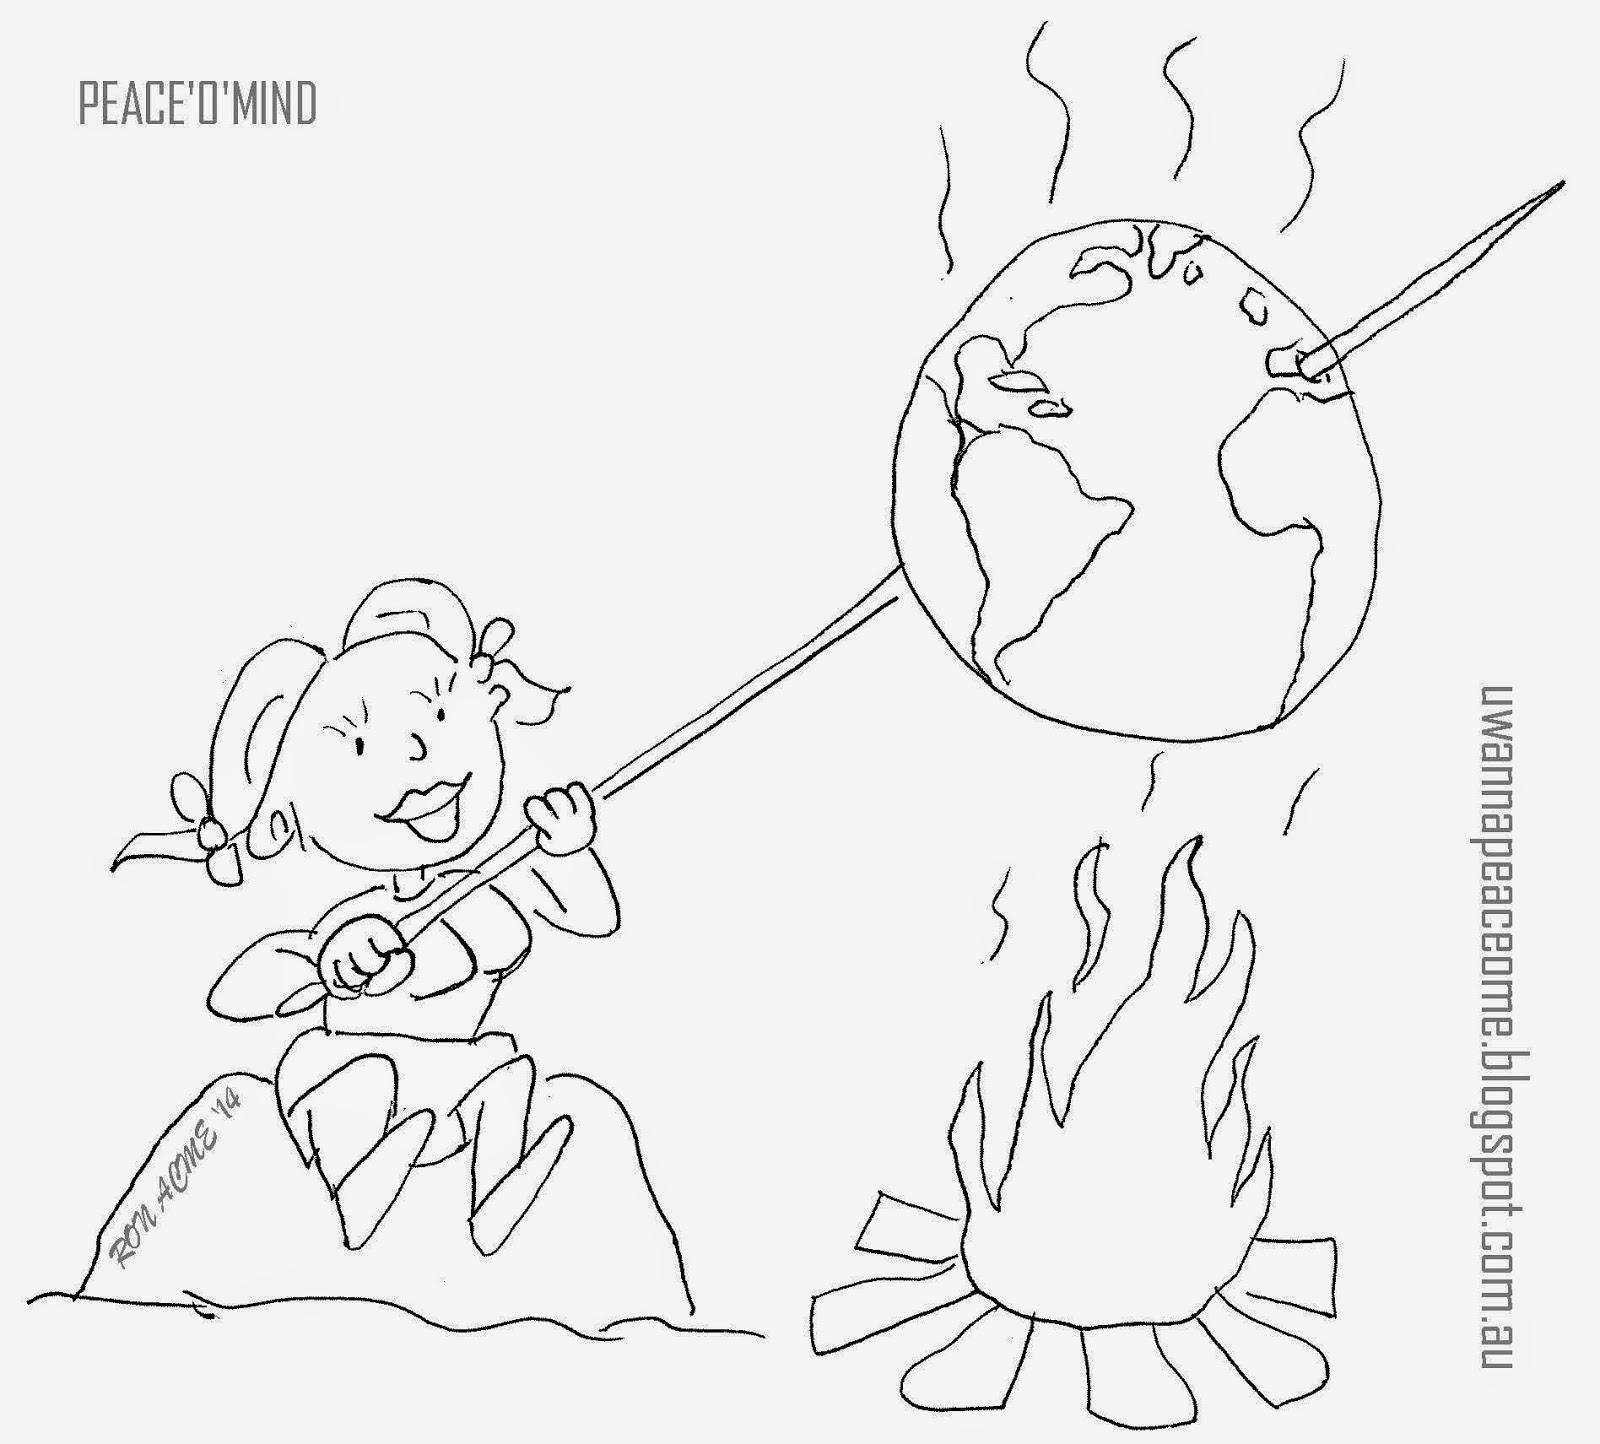 Global Warming Drawing At Getdrawings